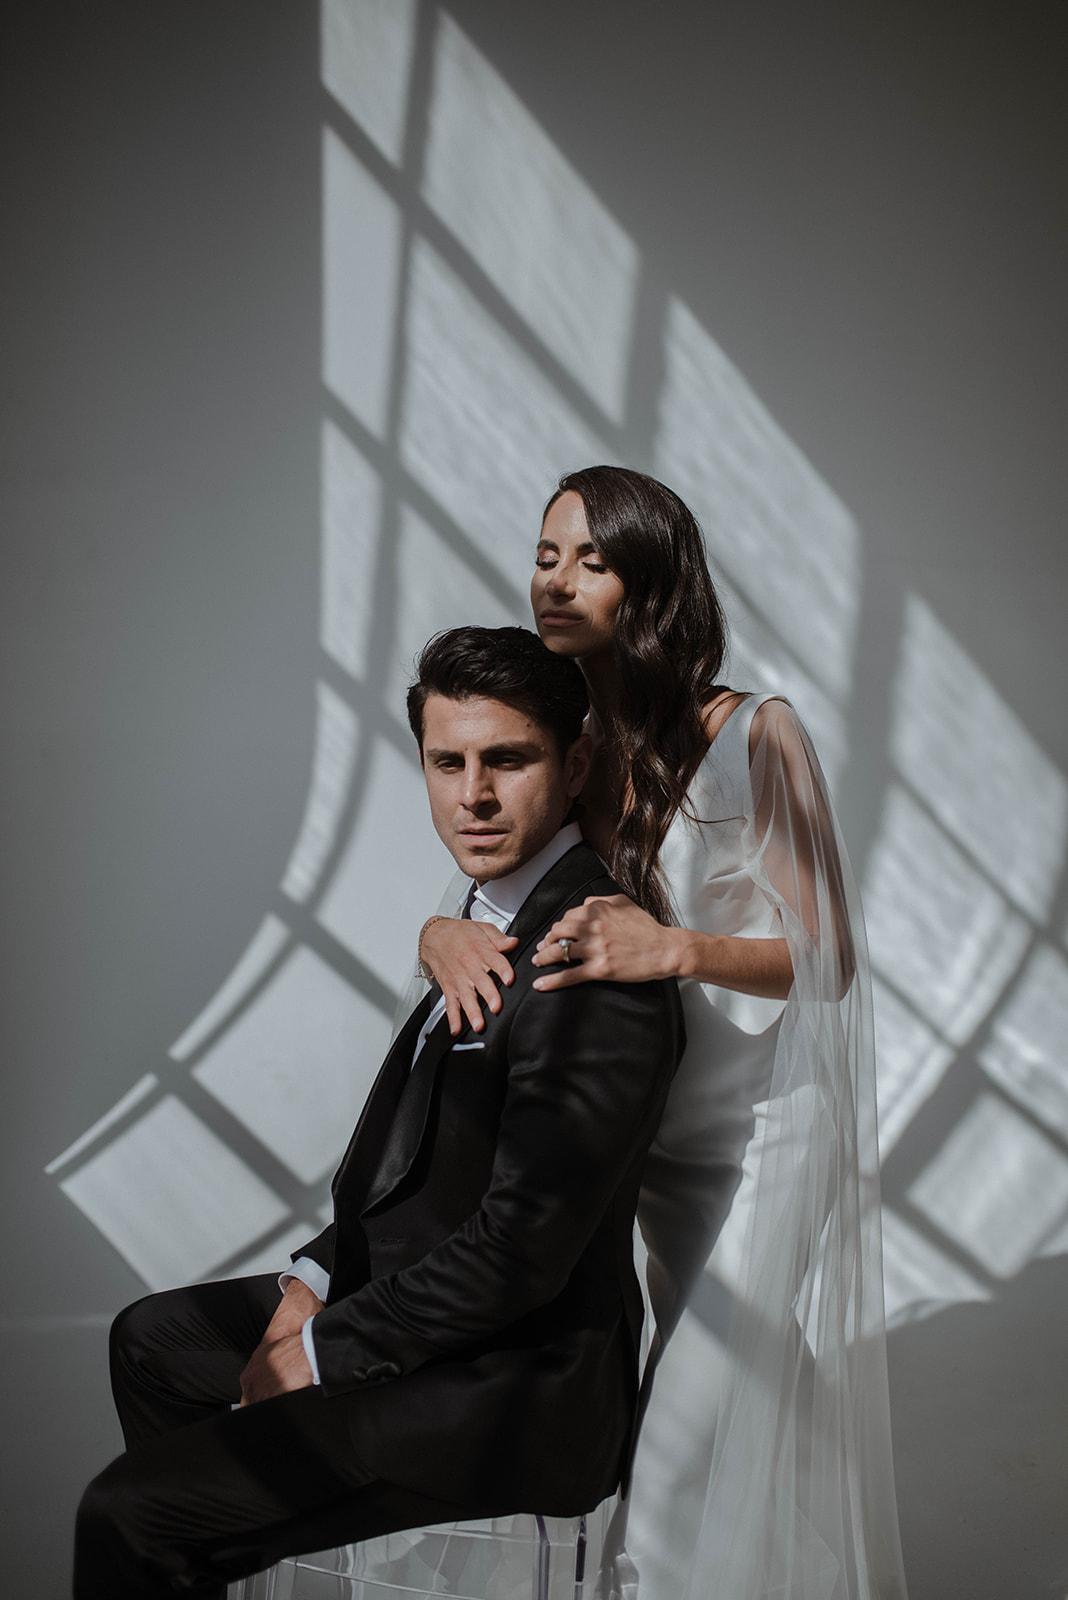 Jenna___Austin_Wedding_Day-_LHP-646.jpg